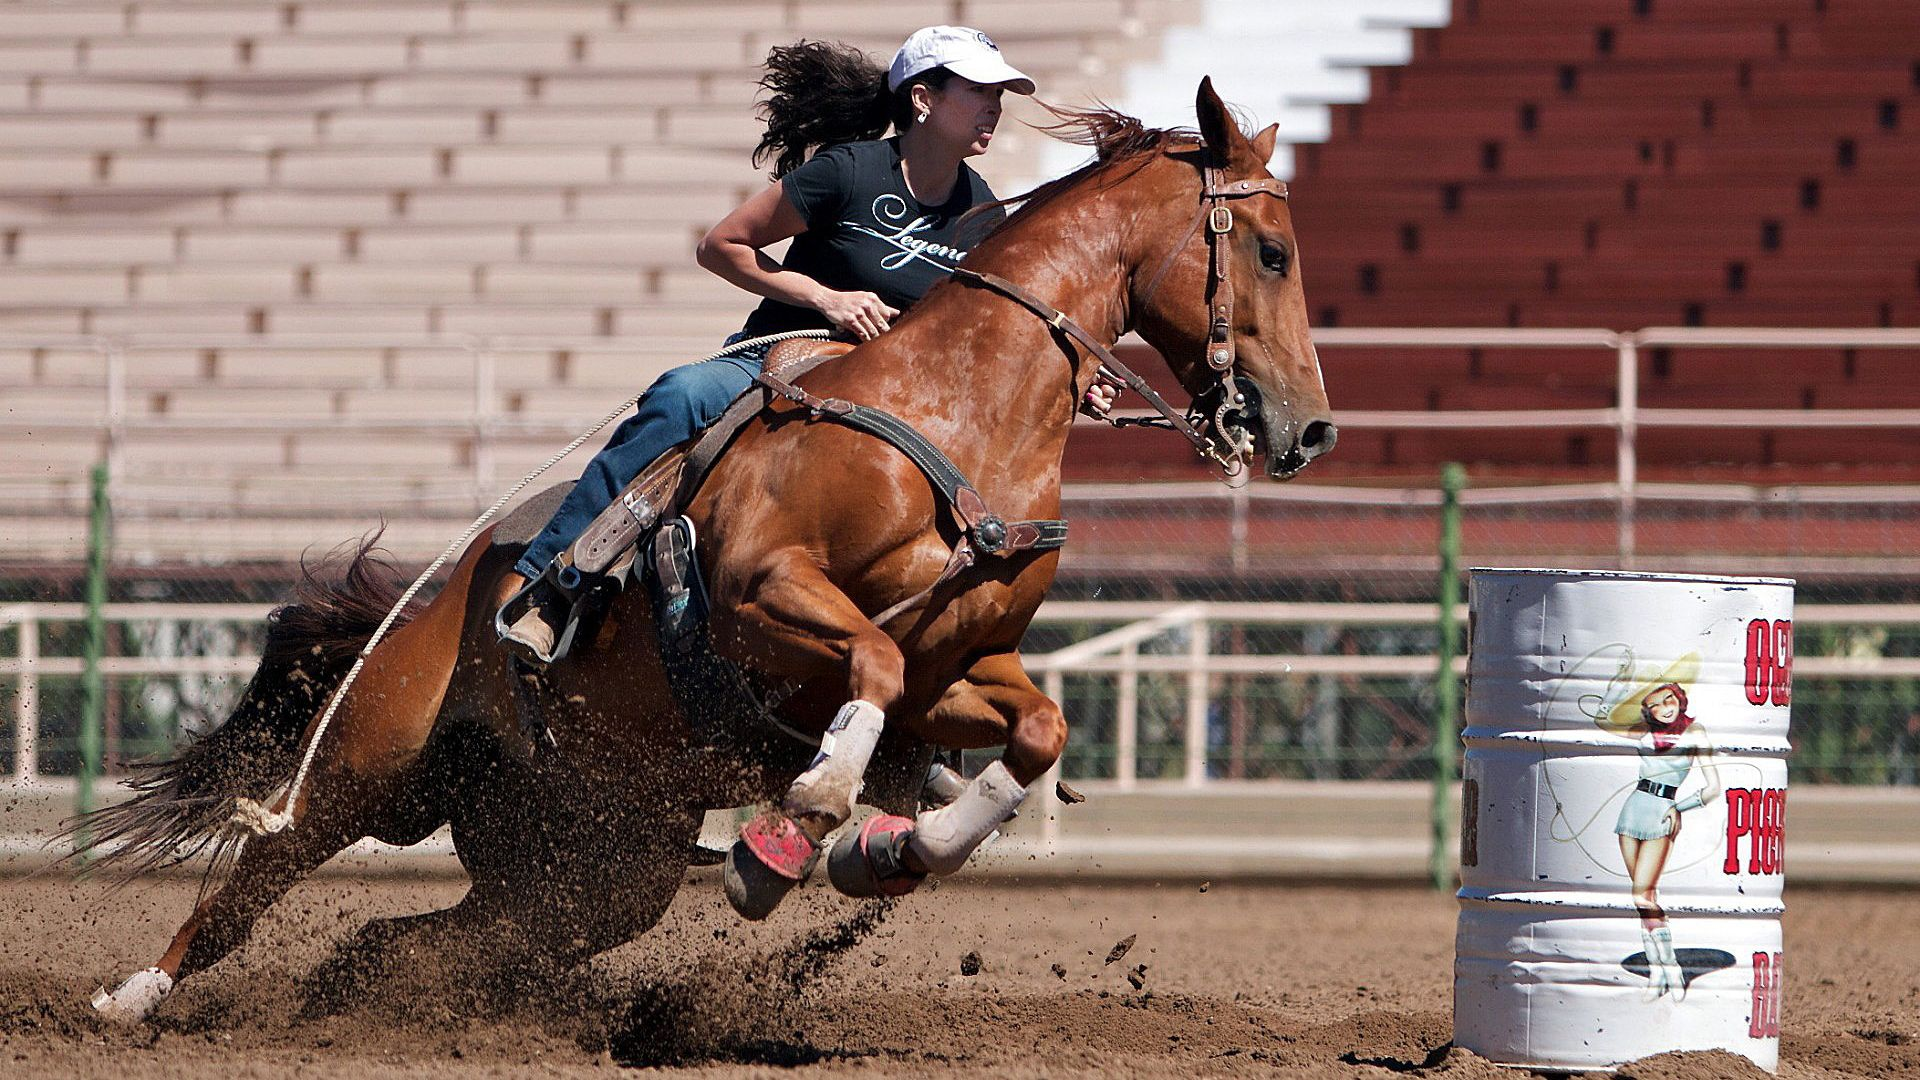 Equestrian vertical wallpaper hd